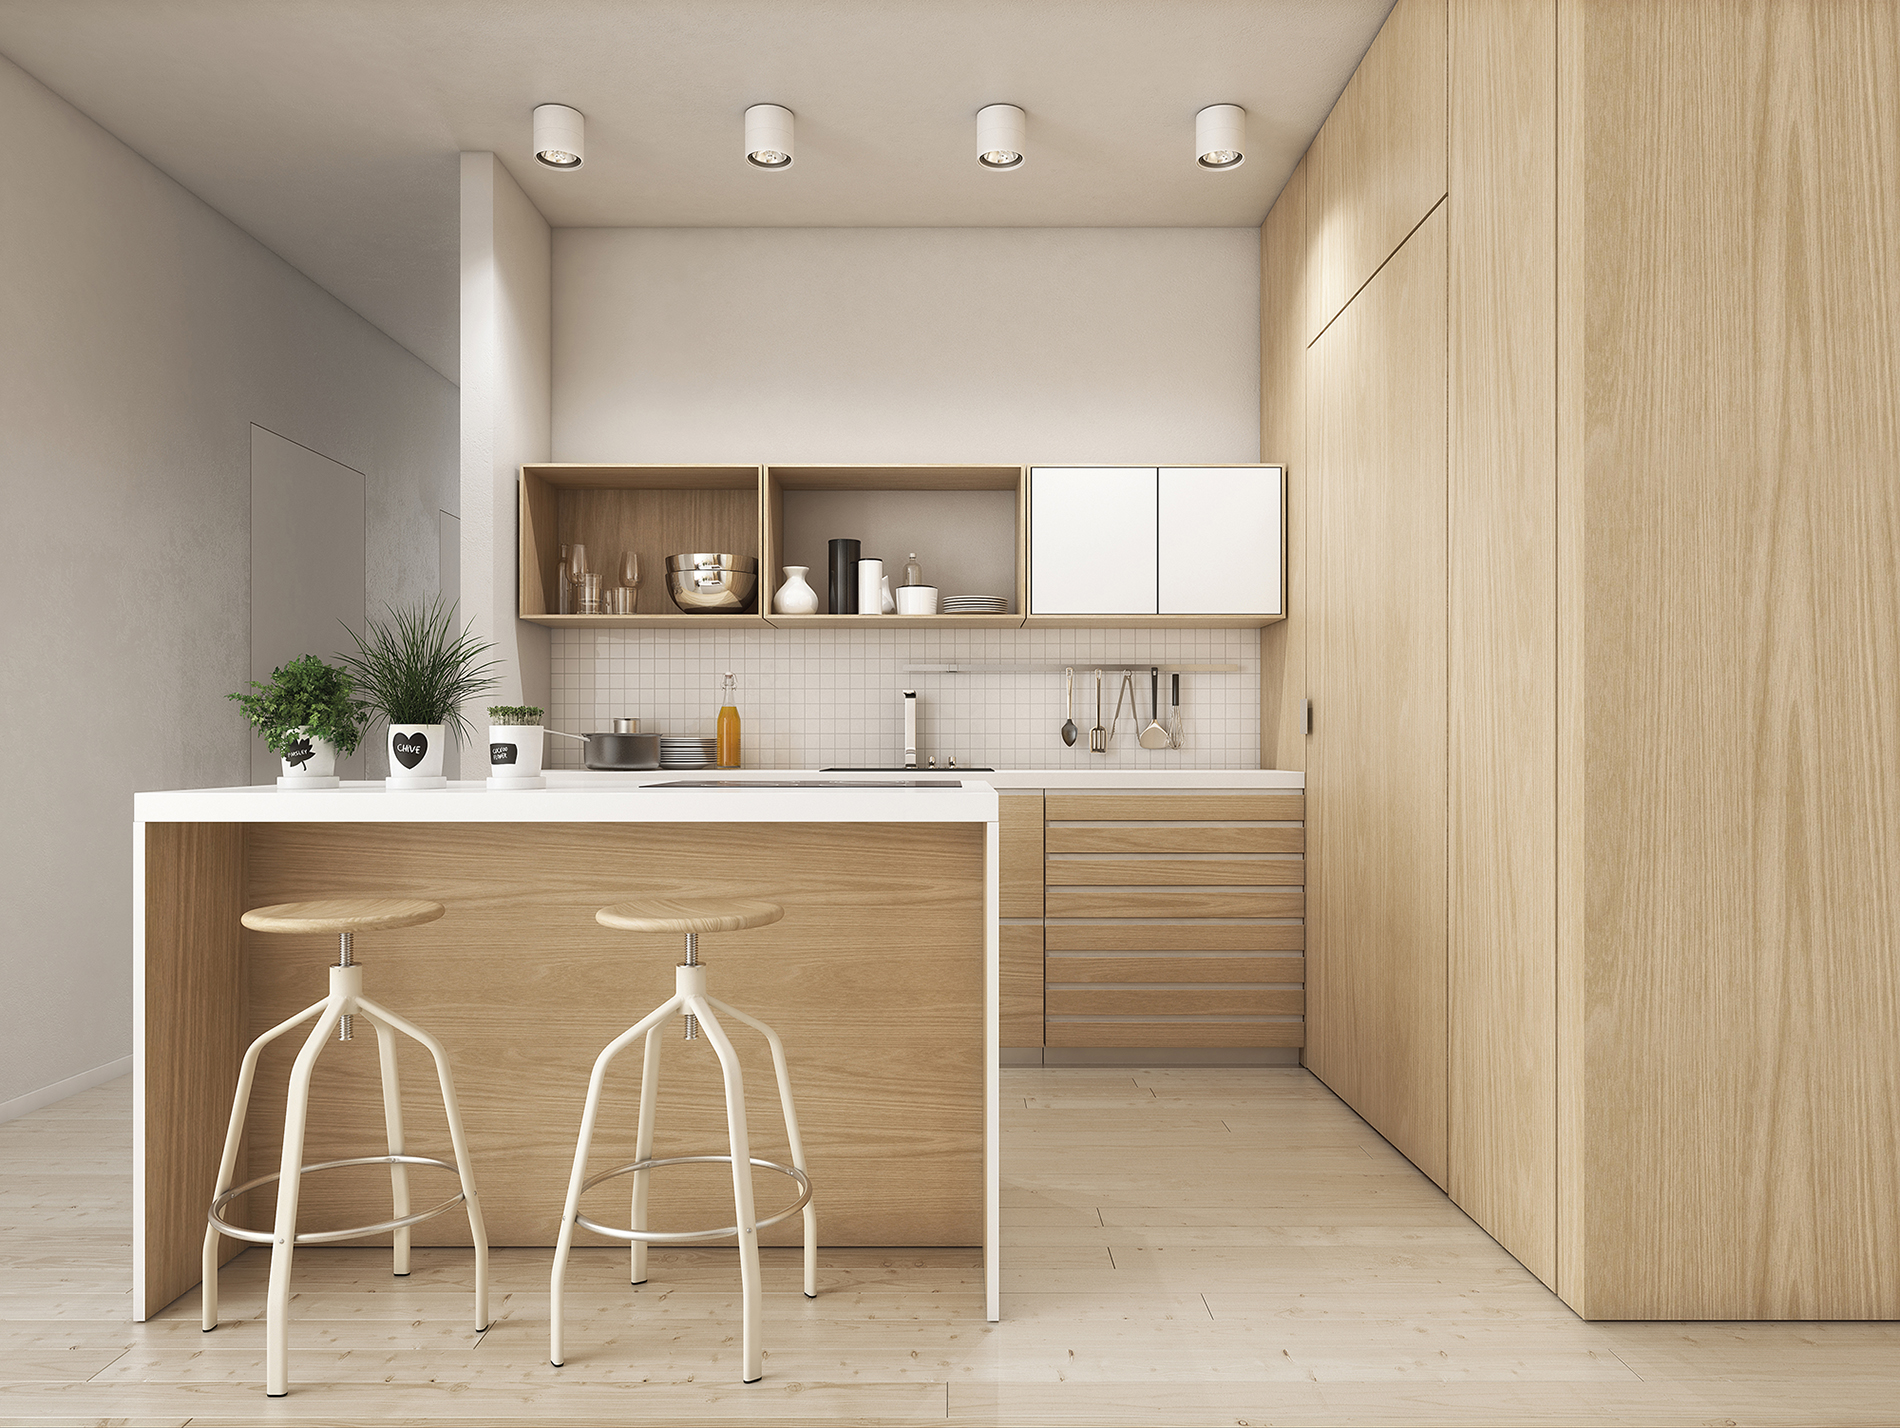 Wood grain - GJ Kitchens - Auckland kitchens, New Zealand ...